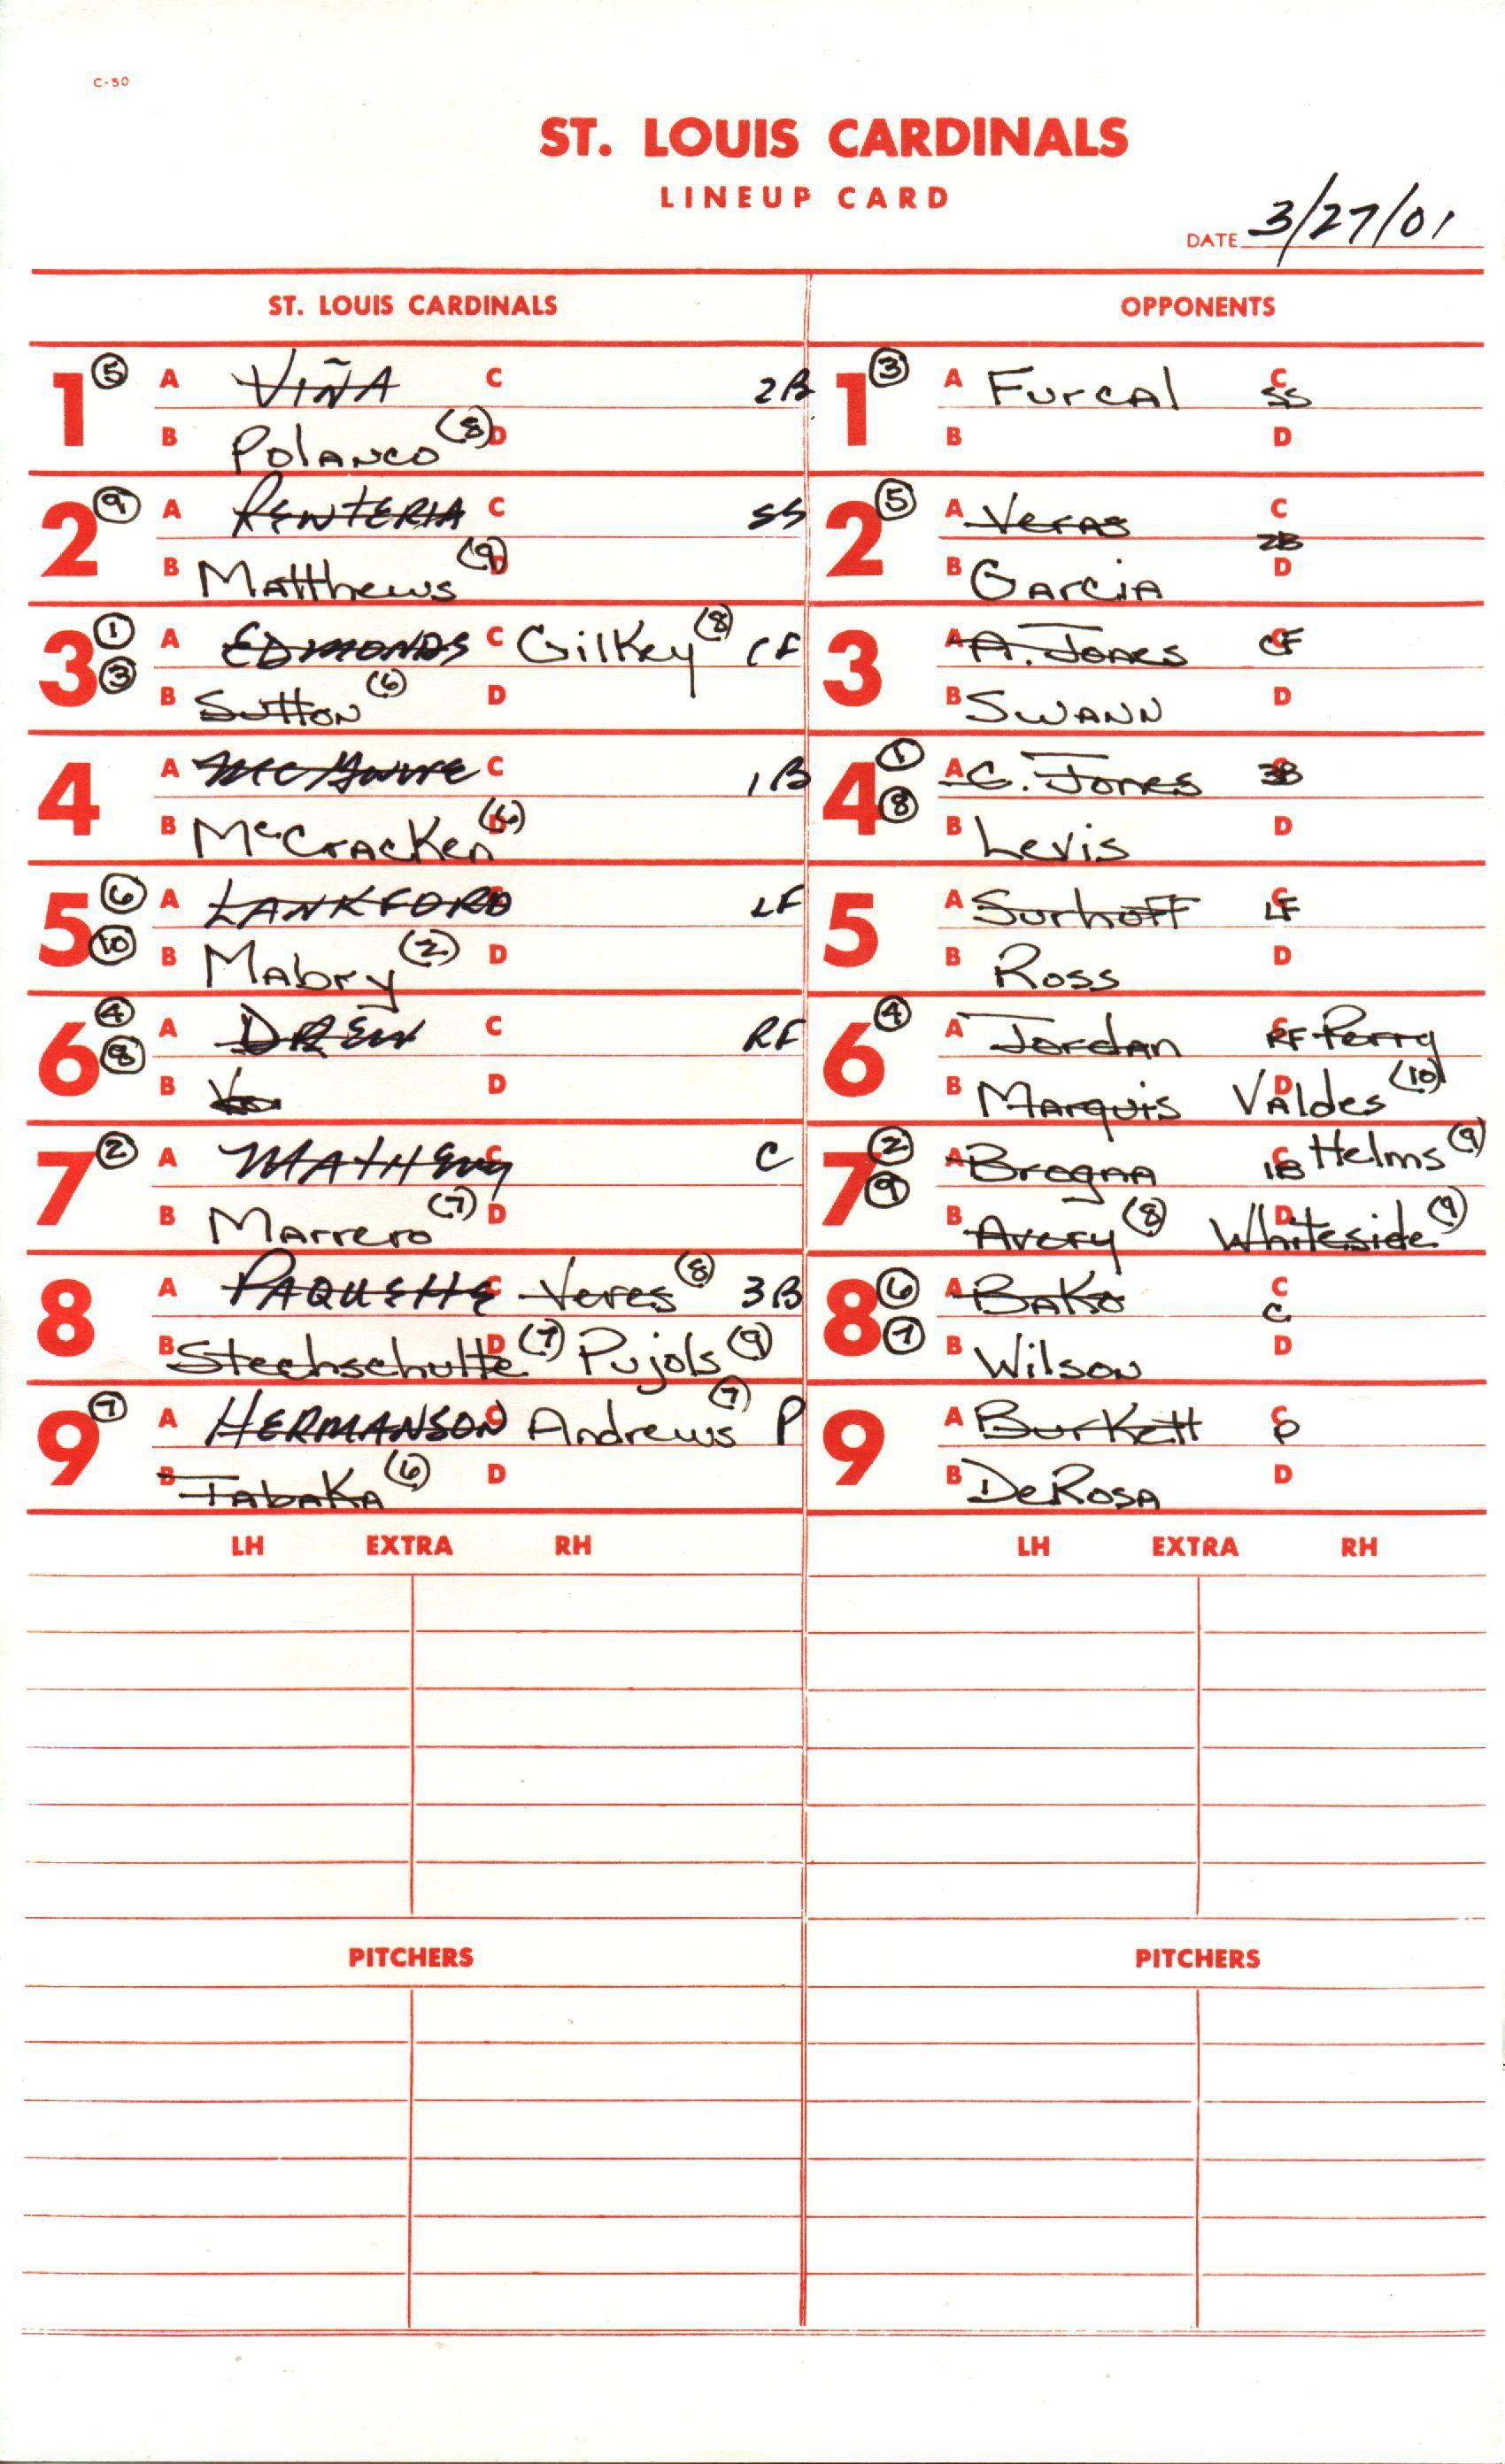 009 Magnificent Little League Lineup Card Template Sample  BaseballFull